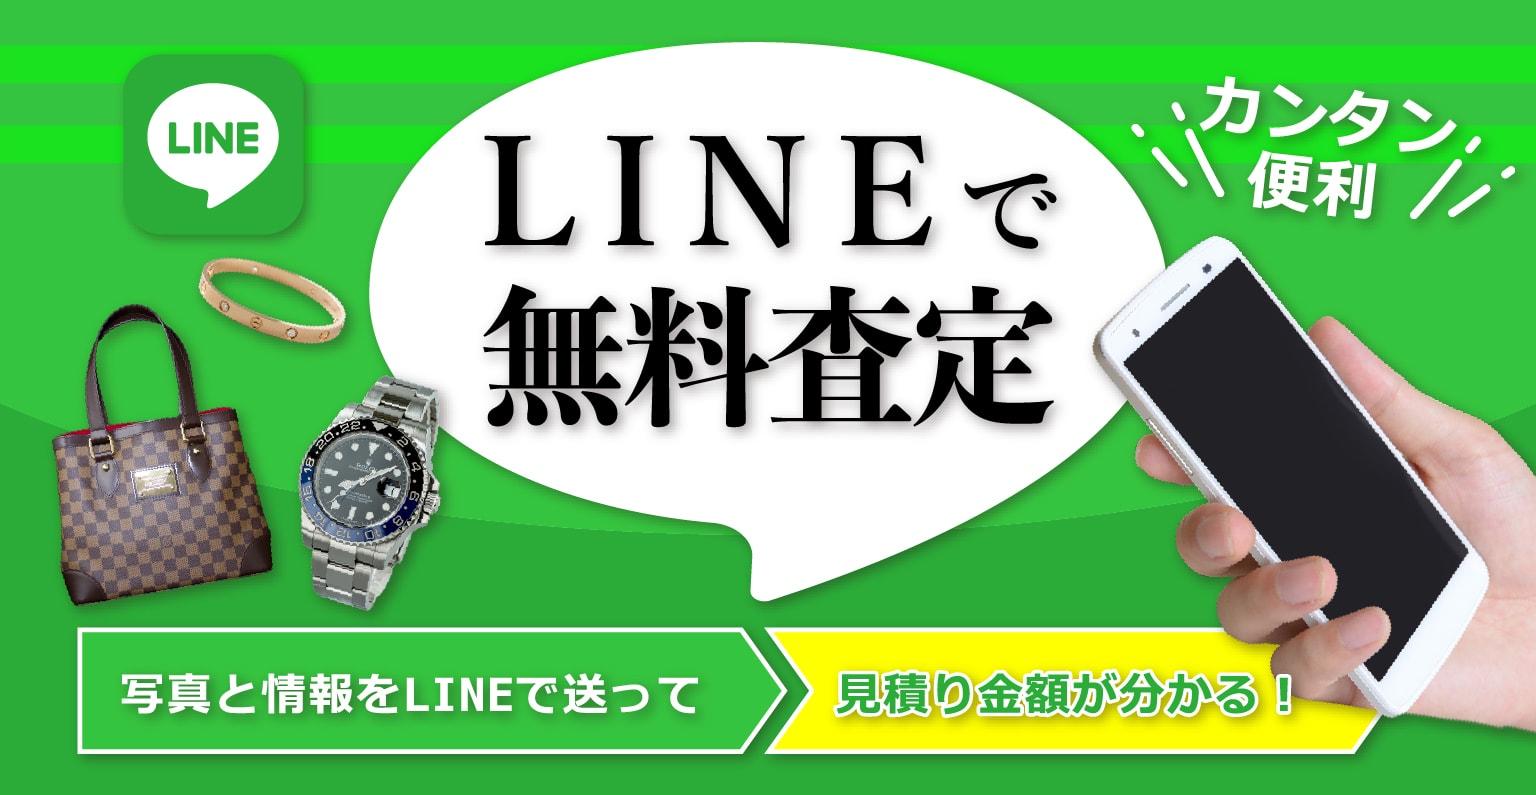 LINEで無料査定